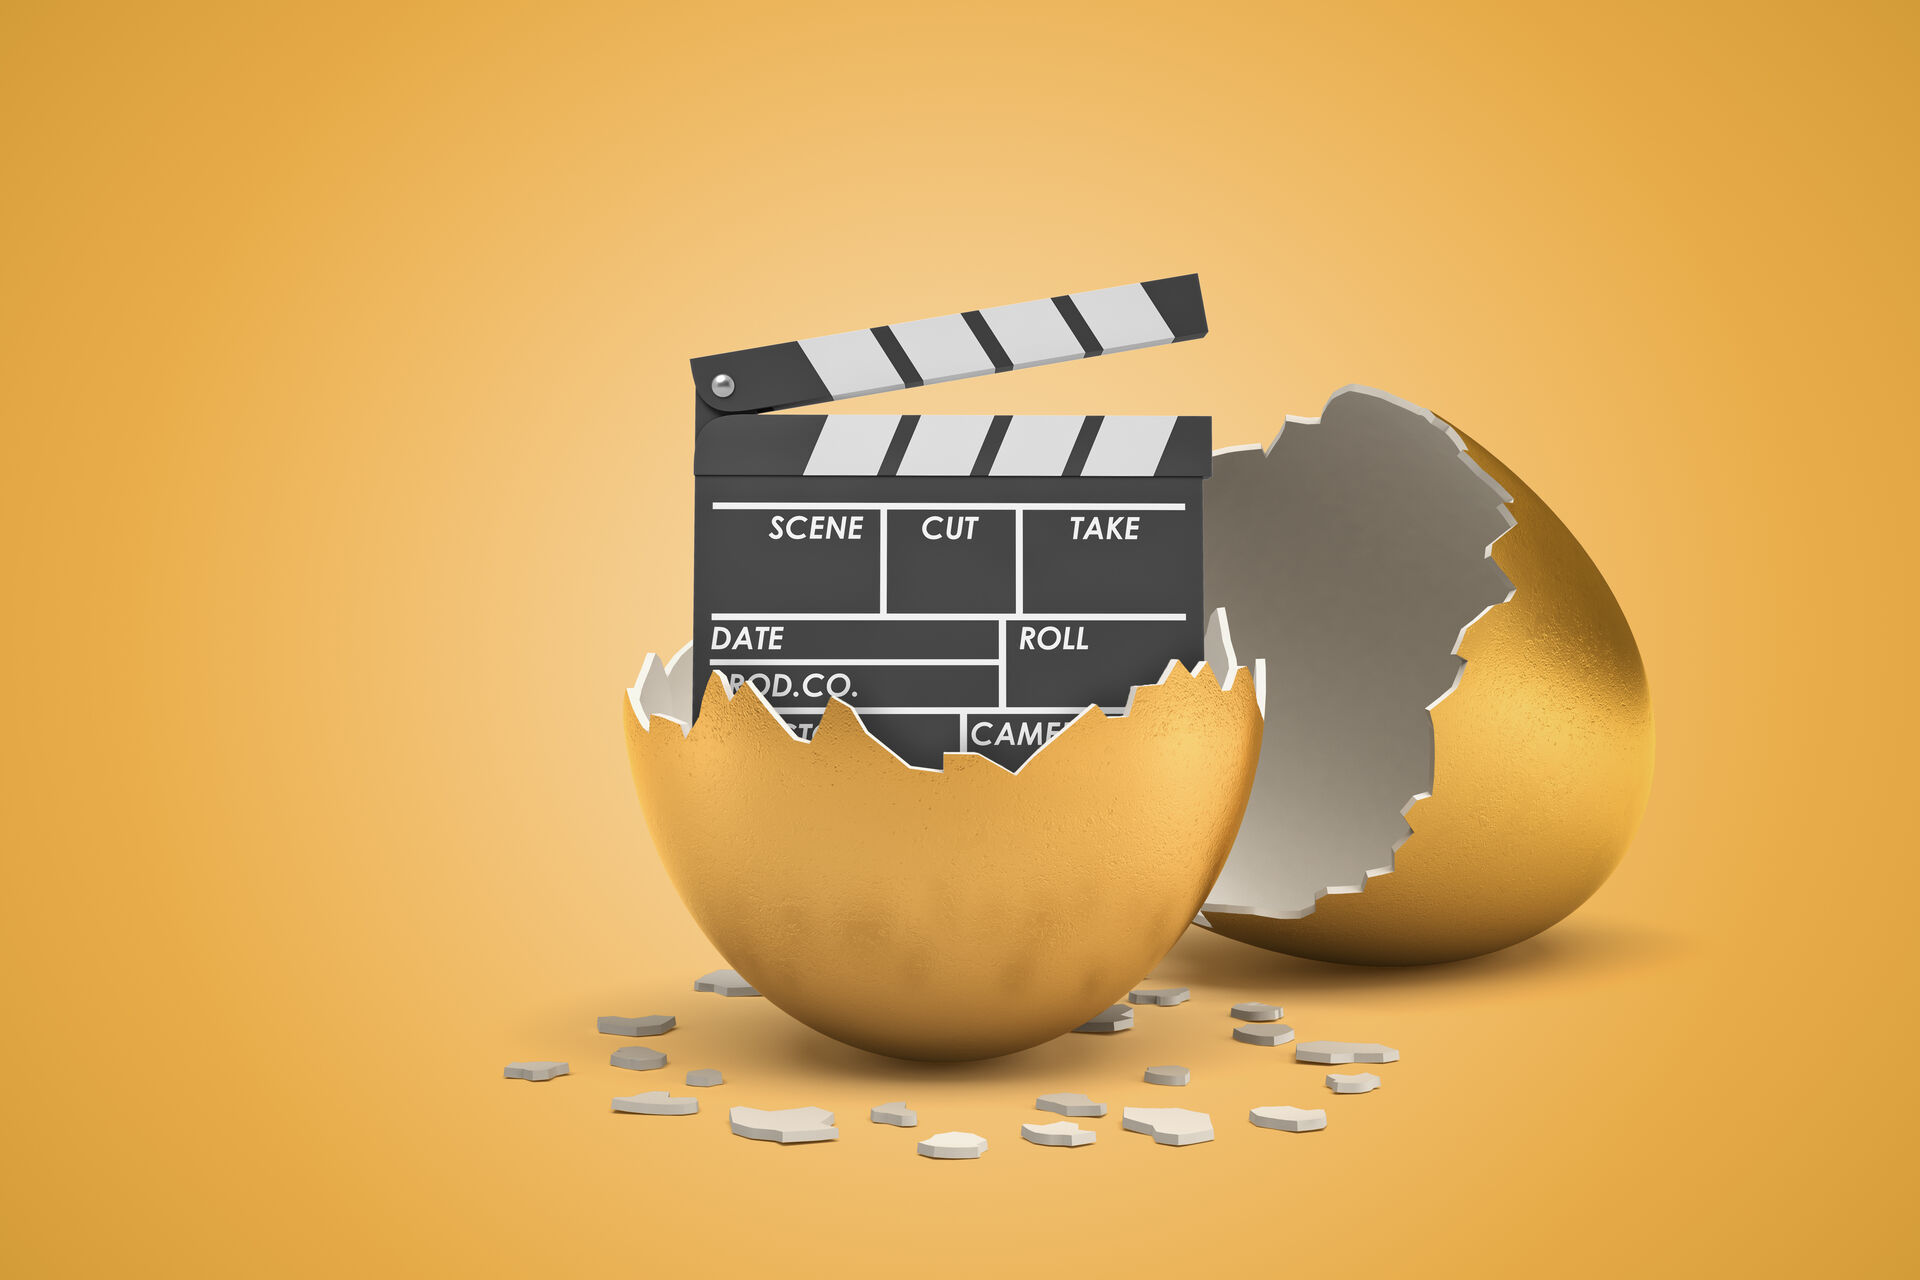 Filmtipps zu Ostern